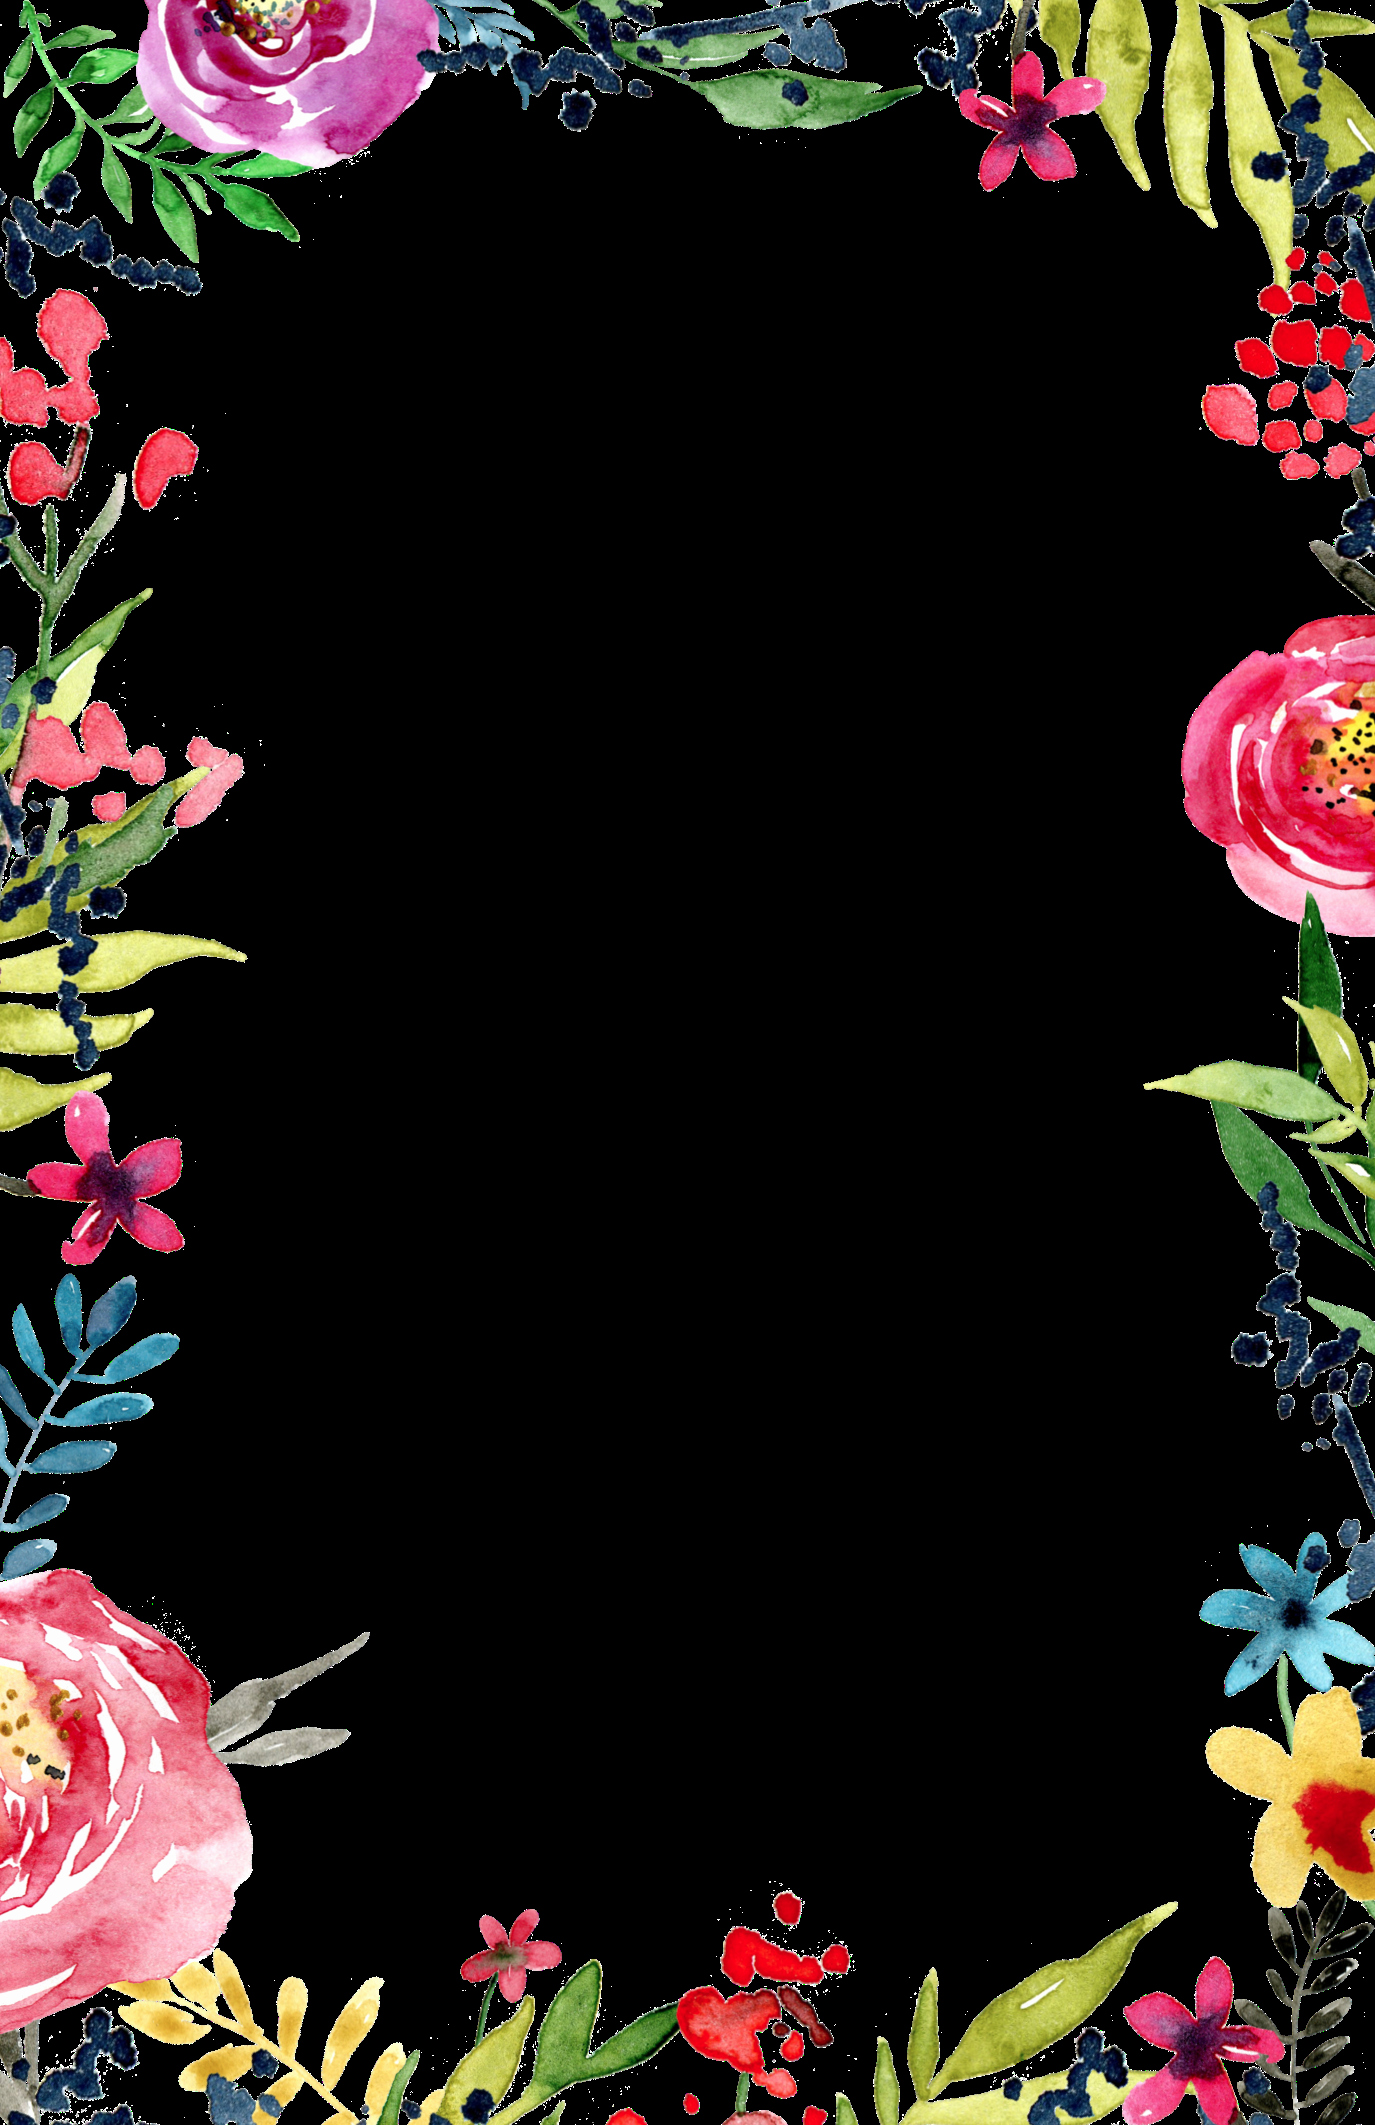 Invitation Templates for Word Beautiful Floral Borders Invitations Free Printable Invitation